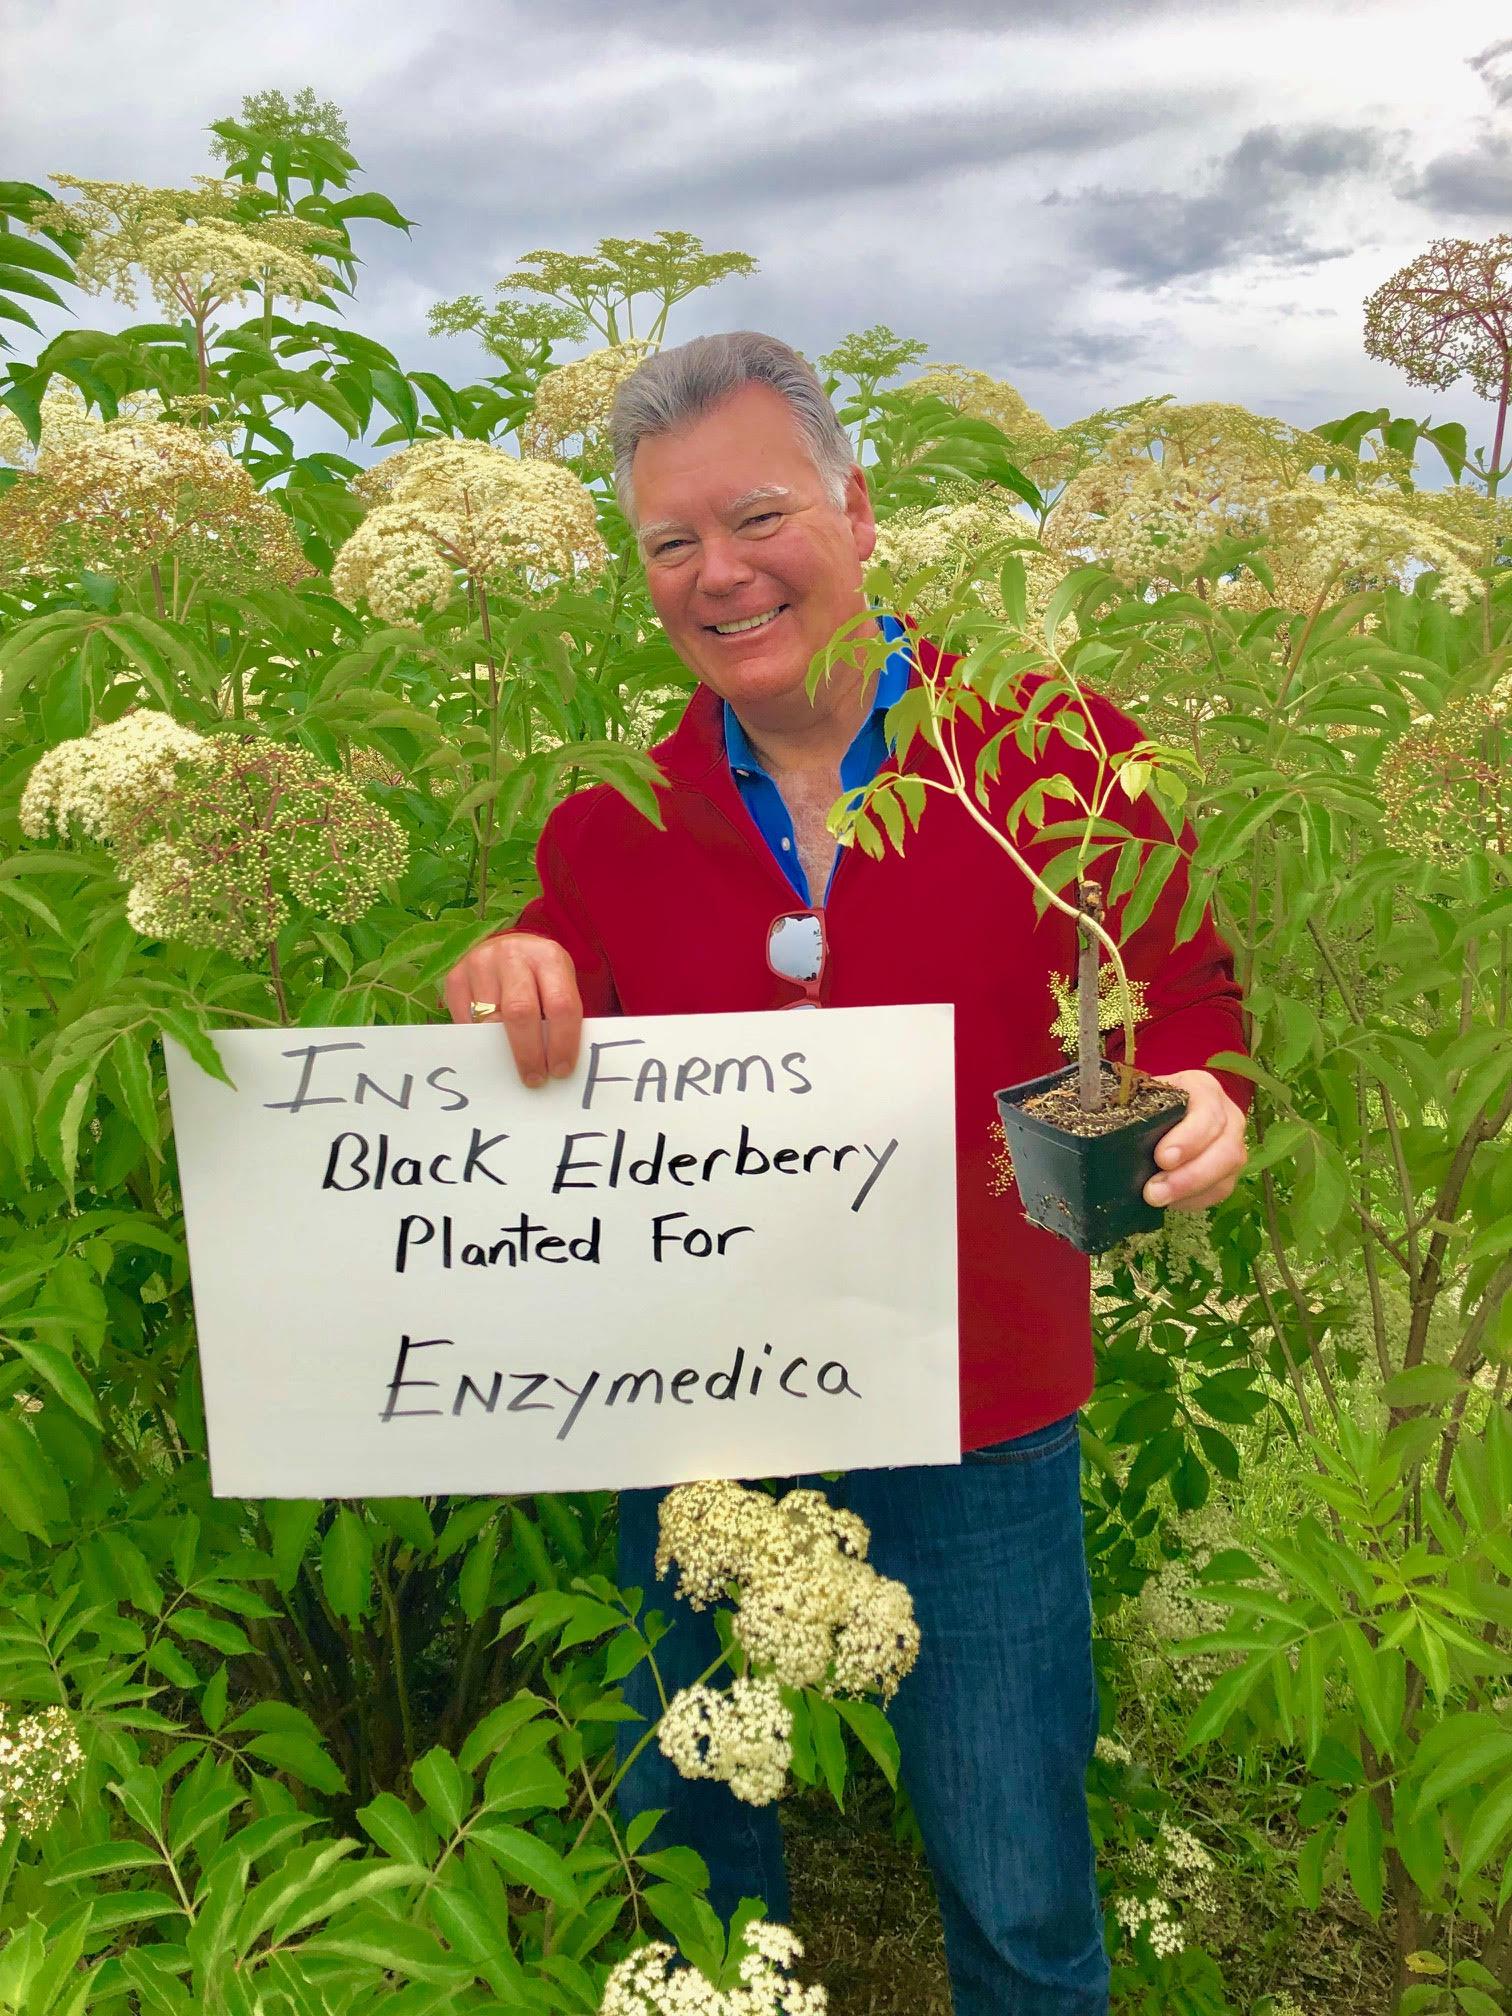 Plant-Elderberry-Enzymedica.jpg